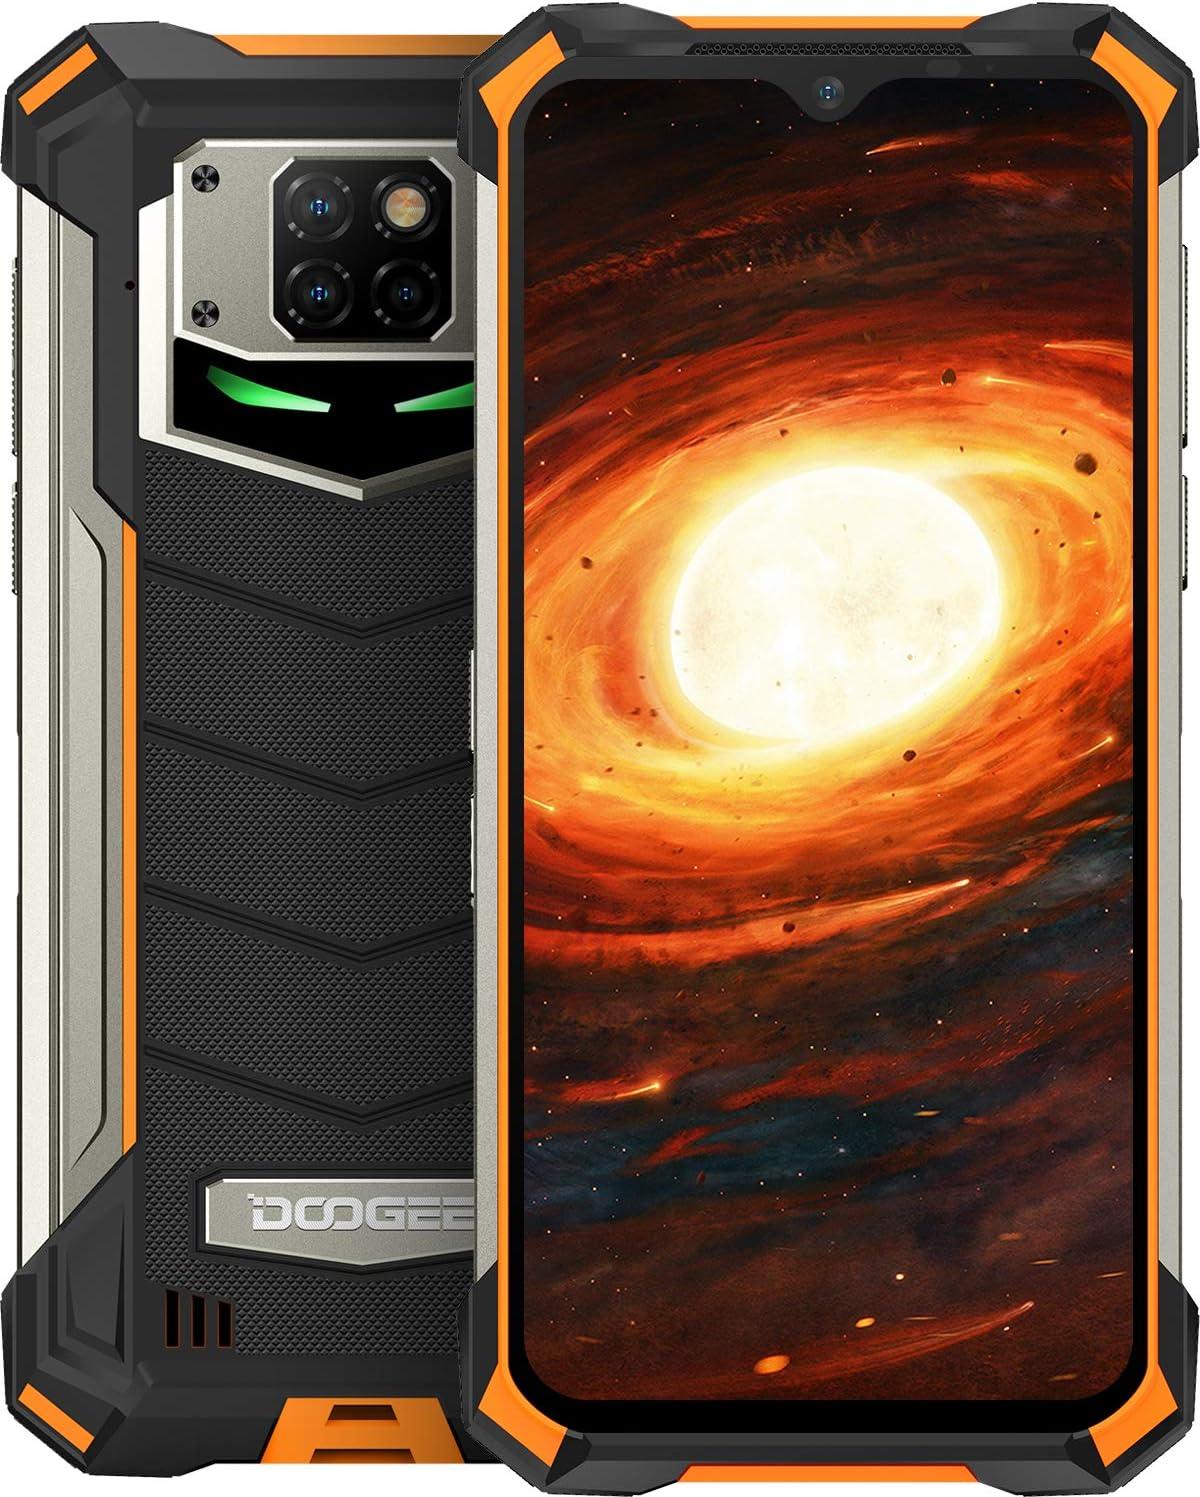 Telefono Móvil Libre, DOOGEE S88 Pro Android 10 Smartphone 4G, Batería 10000mAh 6GB + 128GB, Cámara Triples 21MP+Cámara Frontal 16MP, 6.3 FHD+Pulgada IP68/IP69K Móvil Resistente, LED/NFC/GPS, Naranja